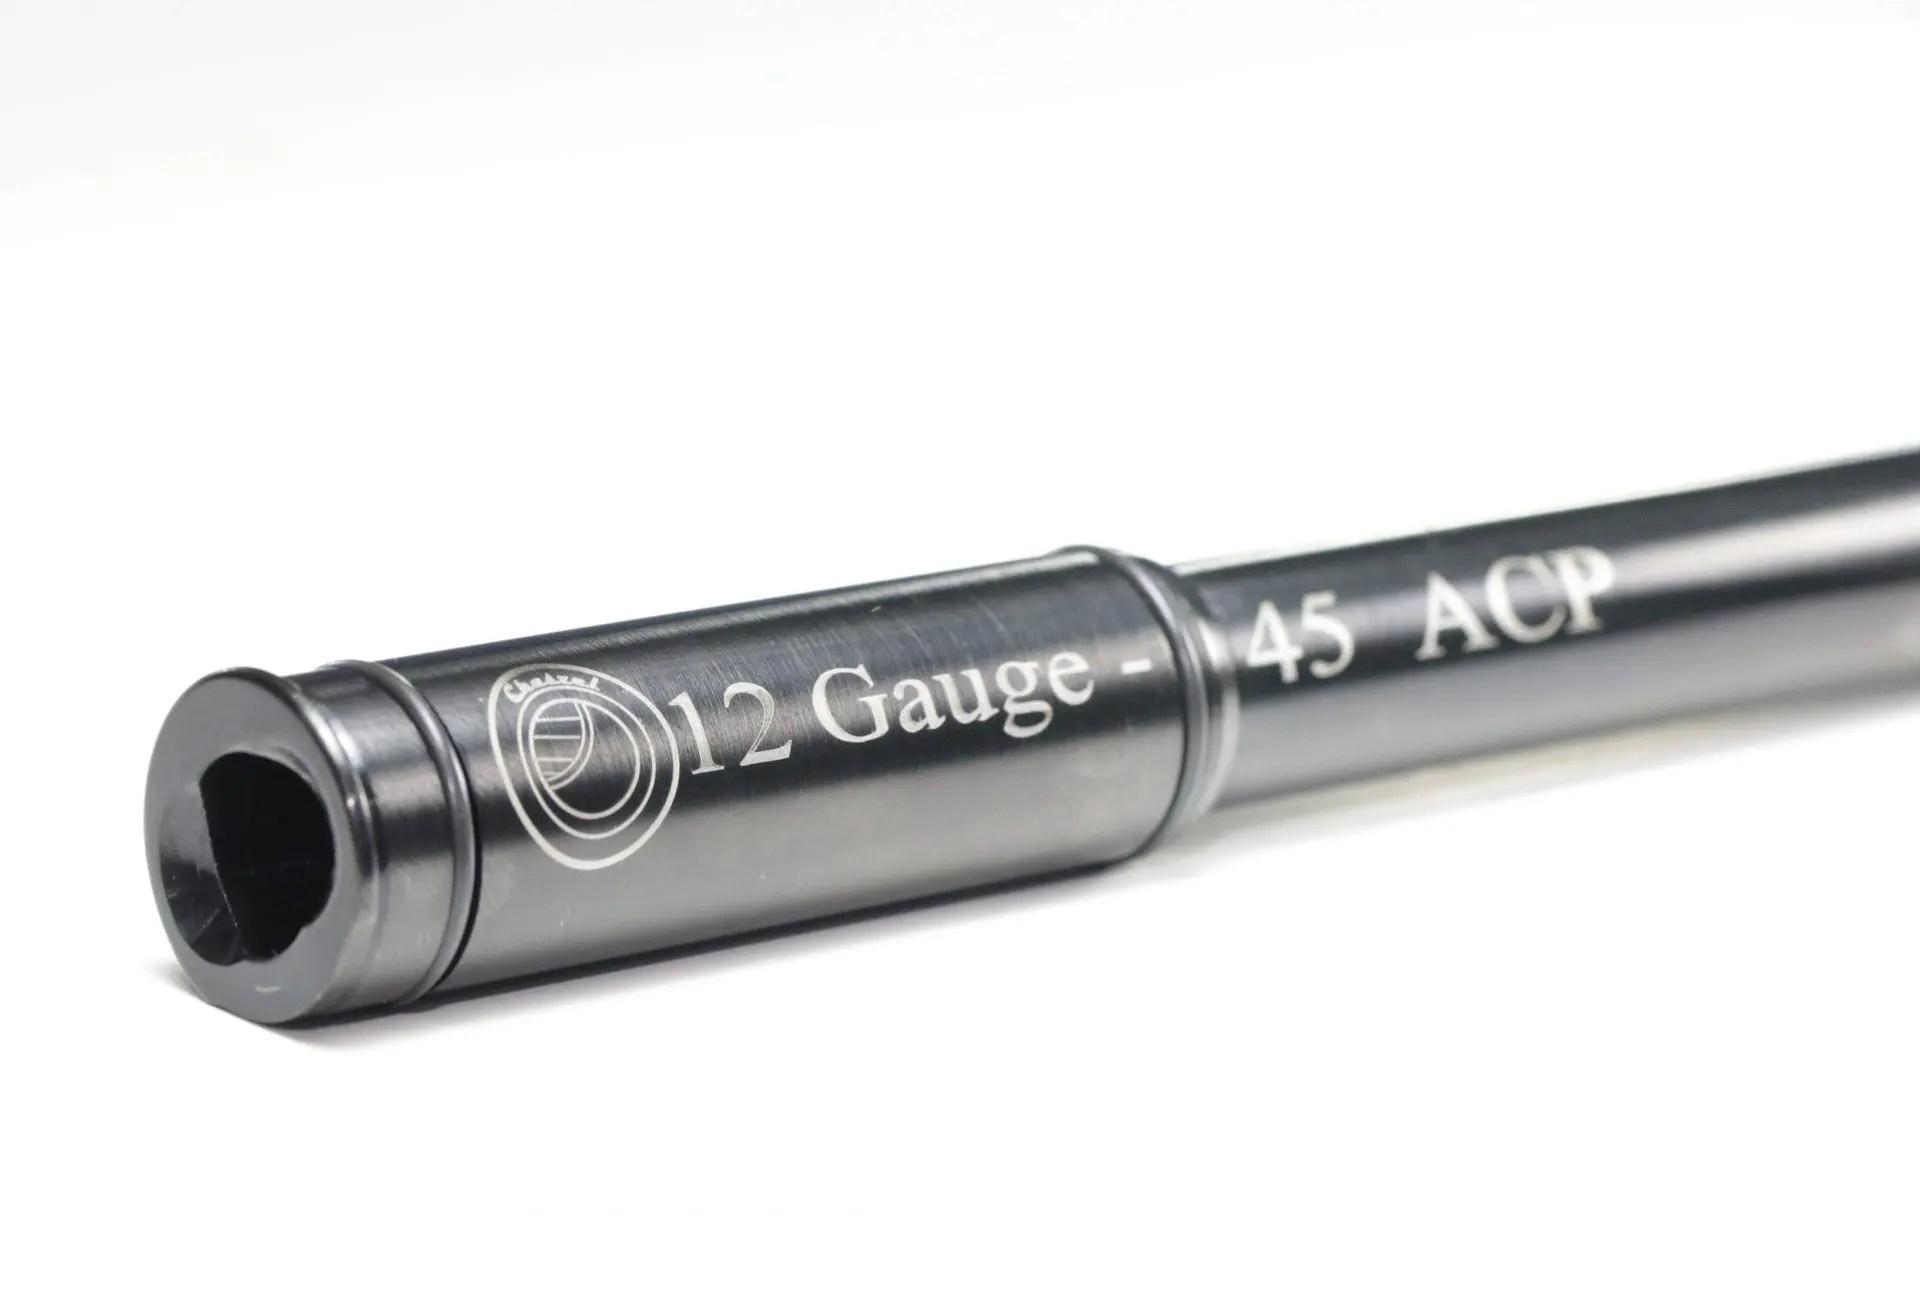 "12 Gauge to 45 ACP RIFLED Shotgun Adapter \ Chamber Reducer Black Oxide 11/"" Long"